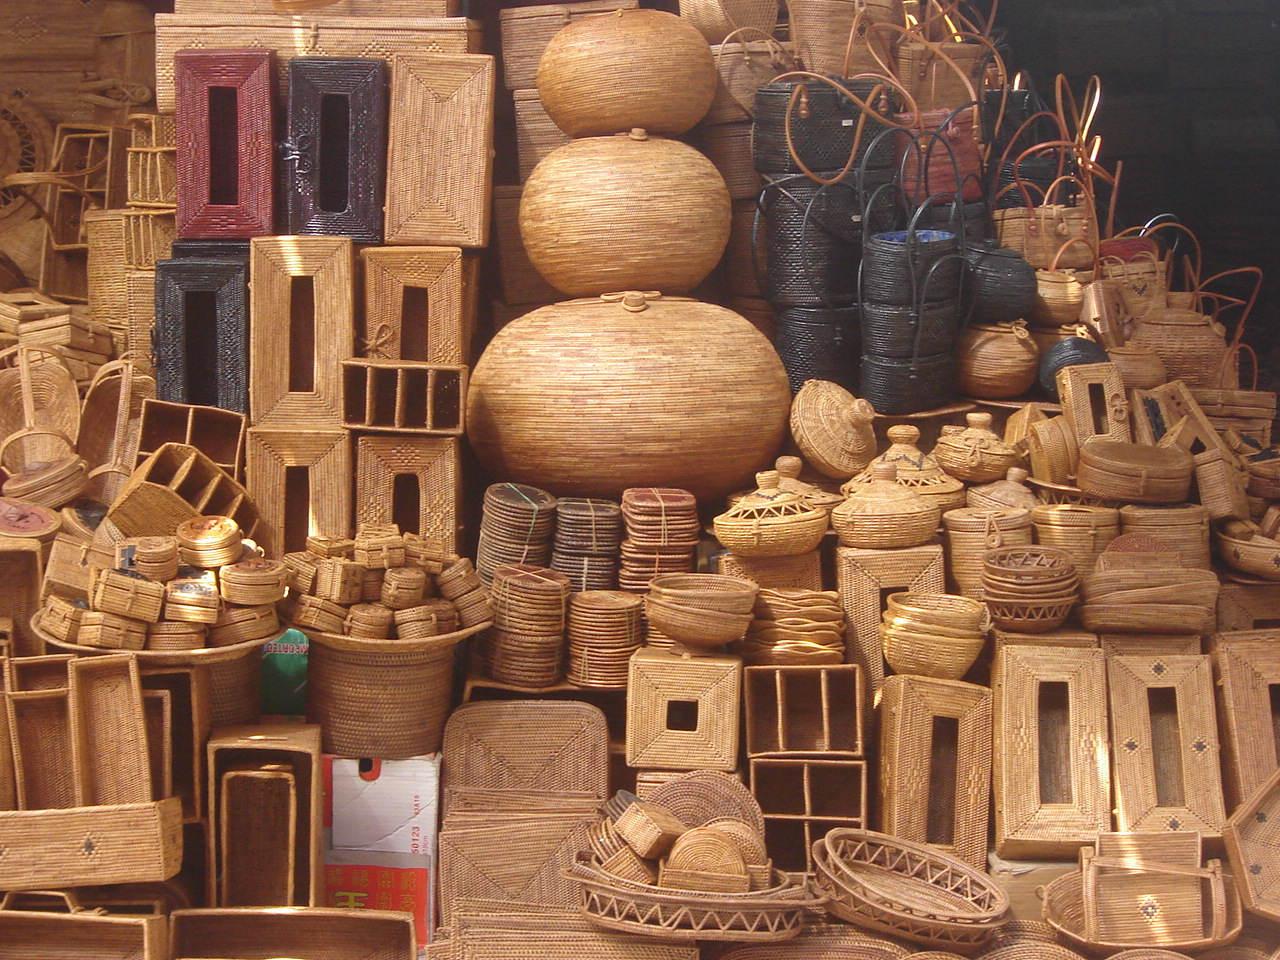 Produk-produk kerajinan tangan. Foto: wikipedia